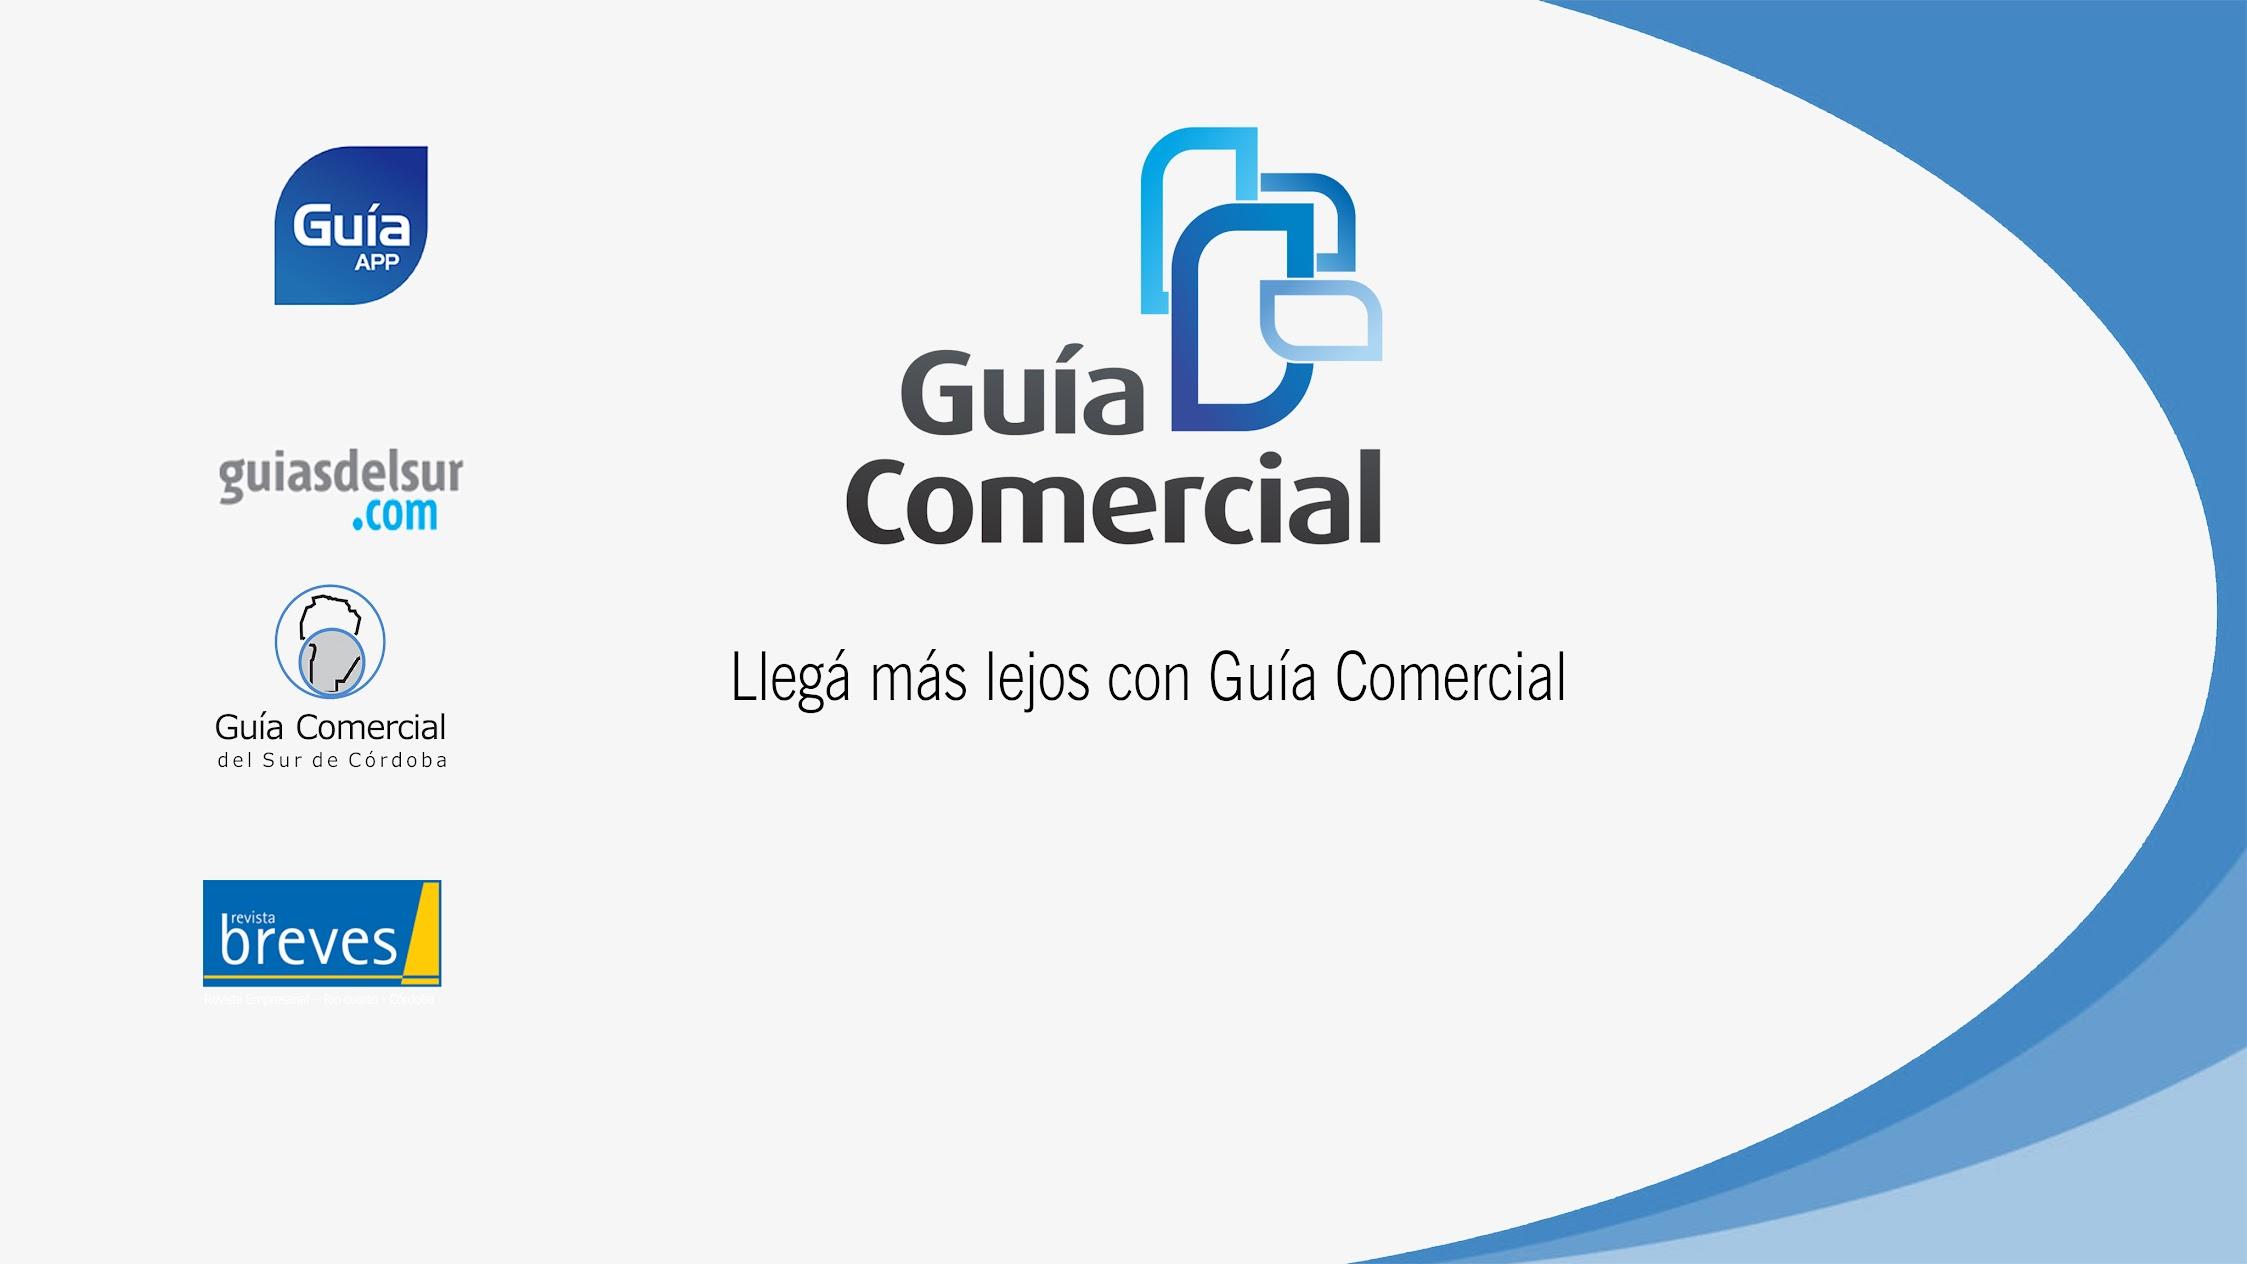 Guia Comercial de Río Cuarto